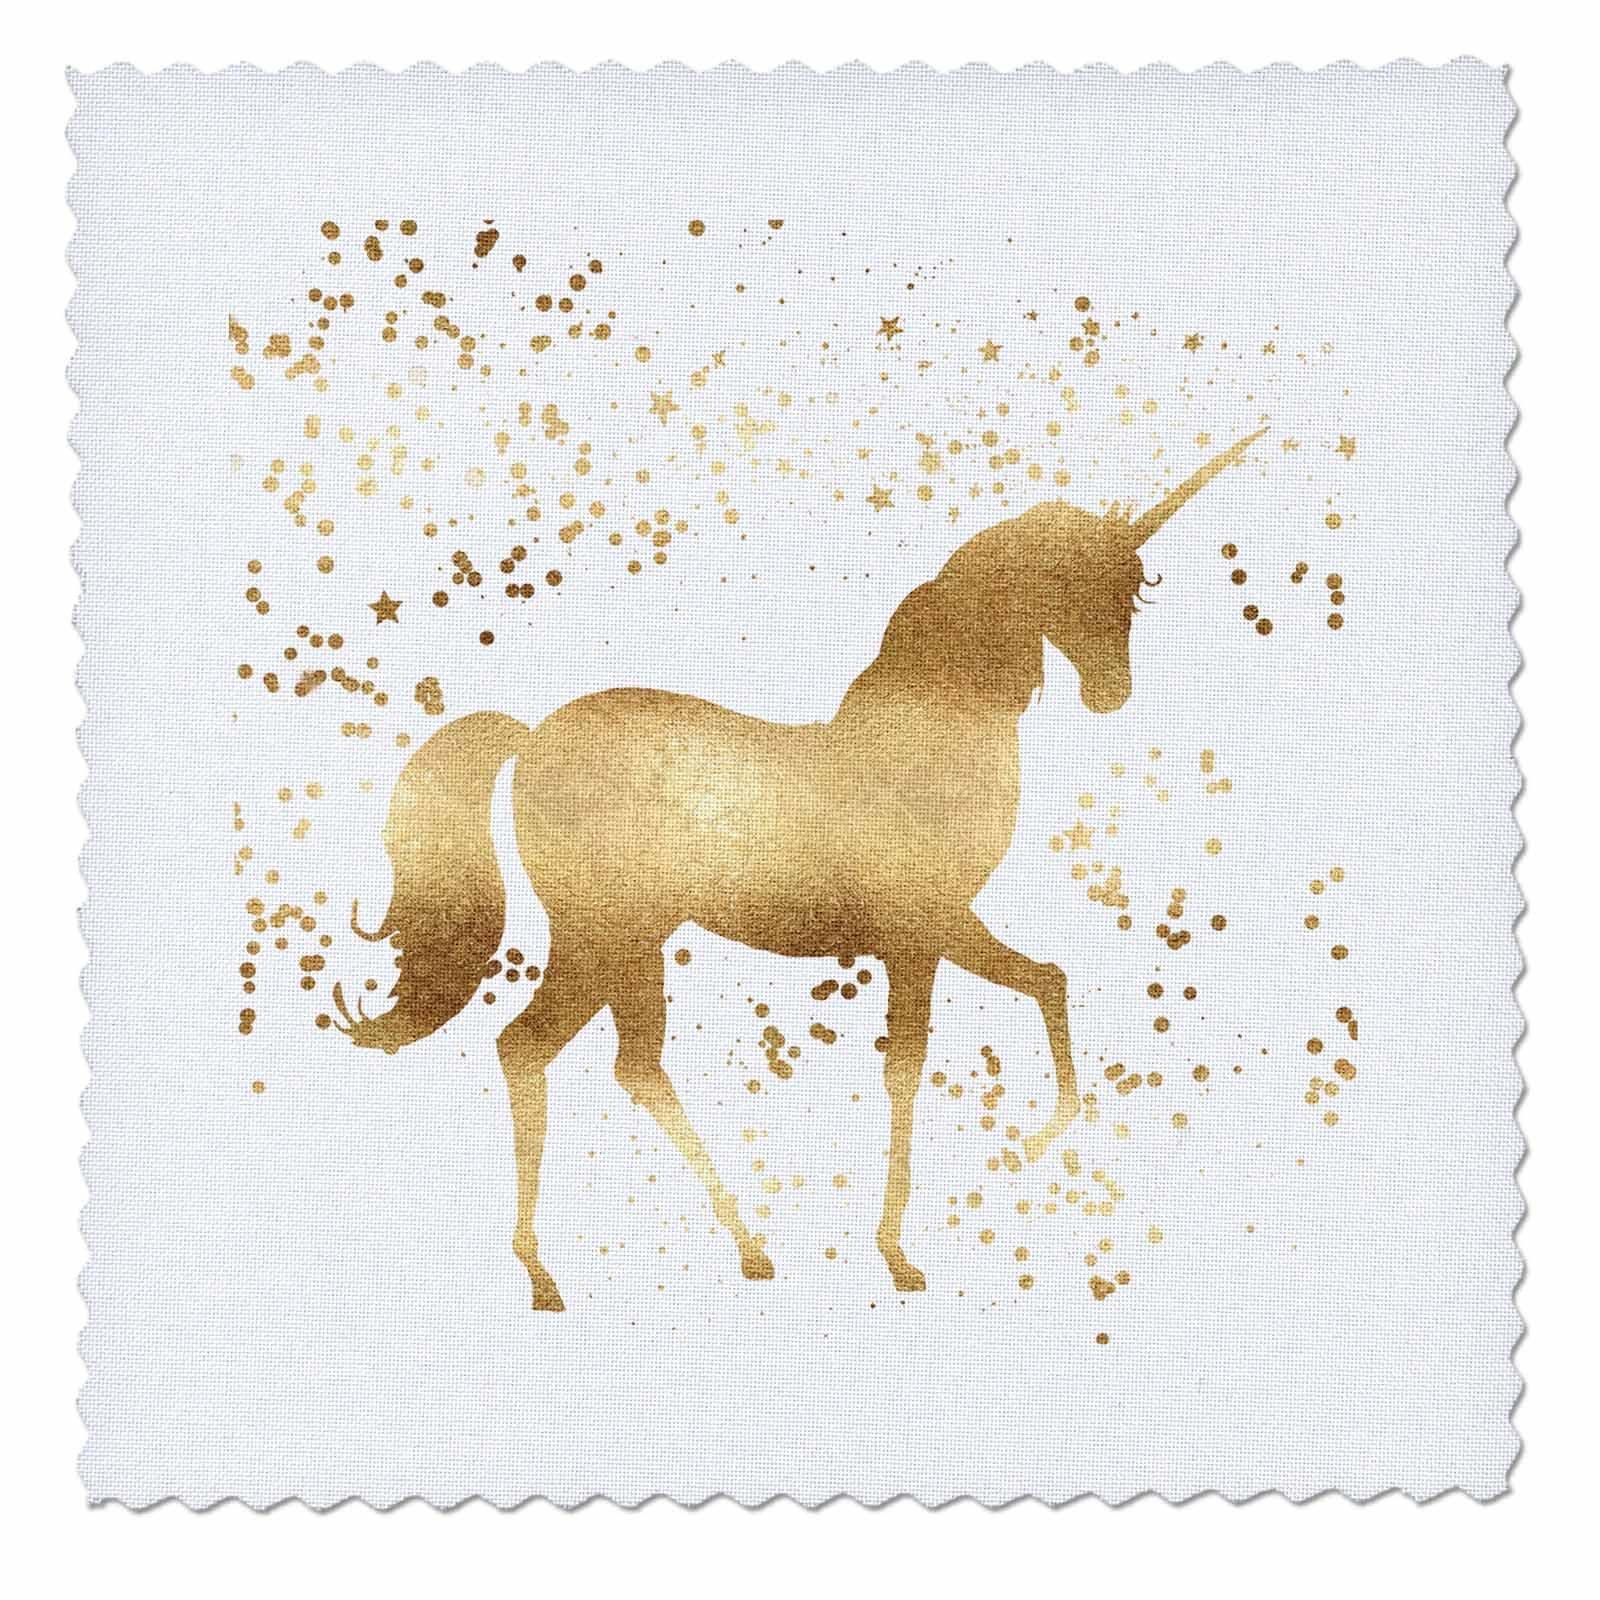 3dRose PS Animals - Image of Gold Confetti Unicorn - 18x18 inch quilt square (qs_280773_7)